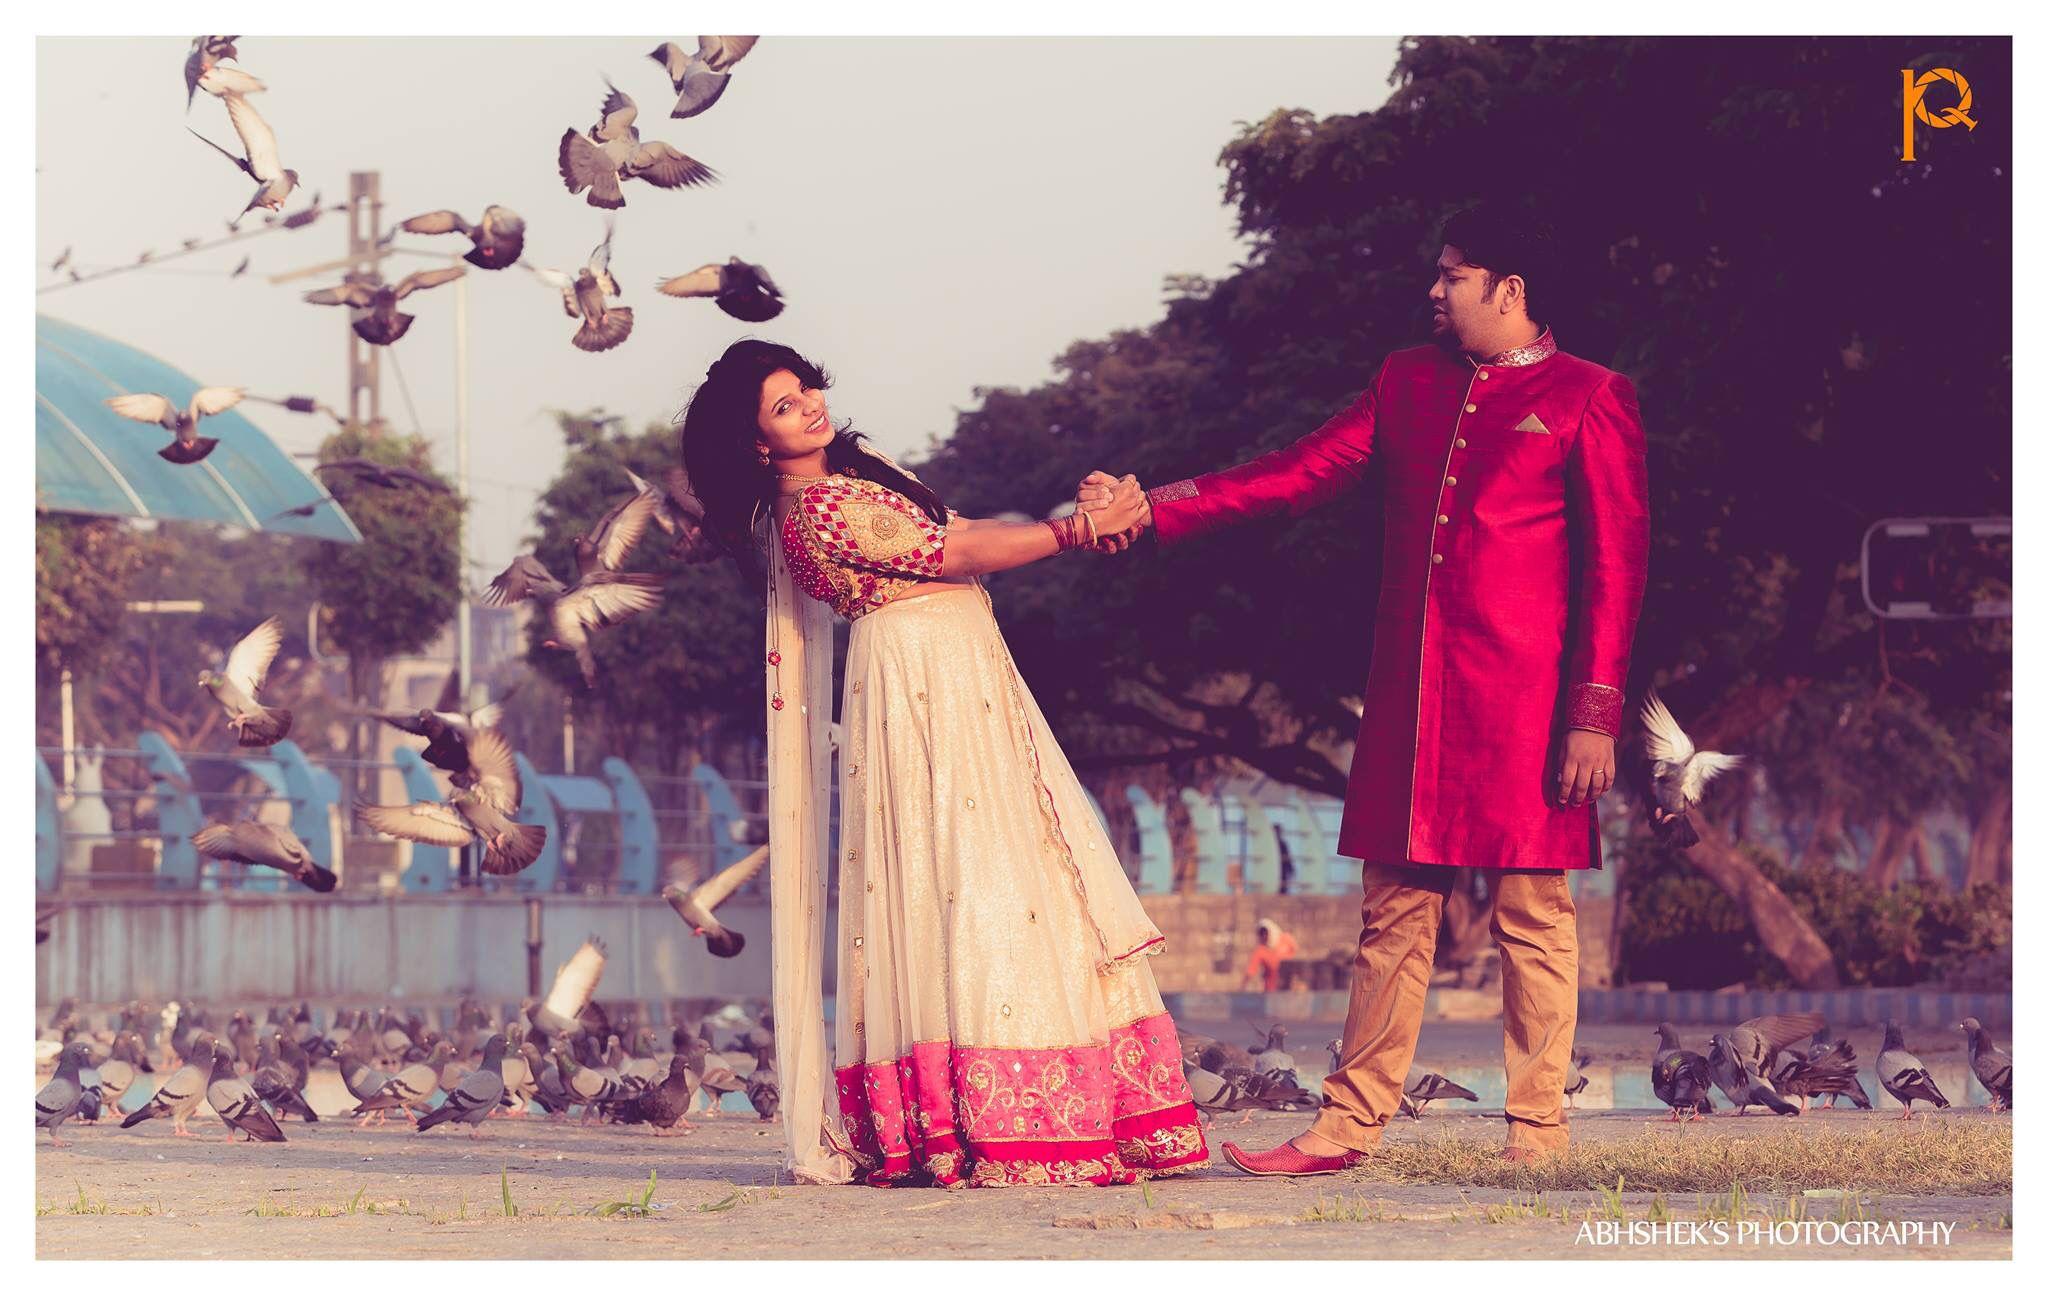 Jenny With Jessy With Abhishek S Photography Marriage Photos Wedding Photoshoot Prewedding Photography